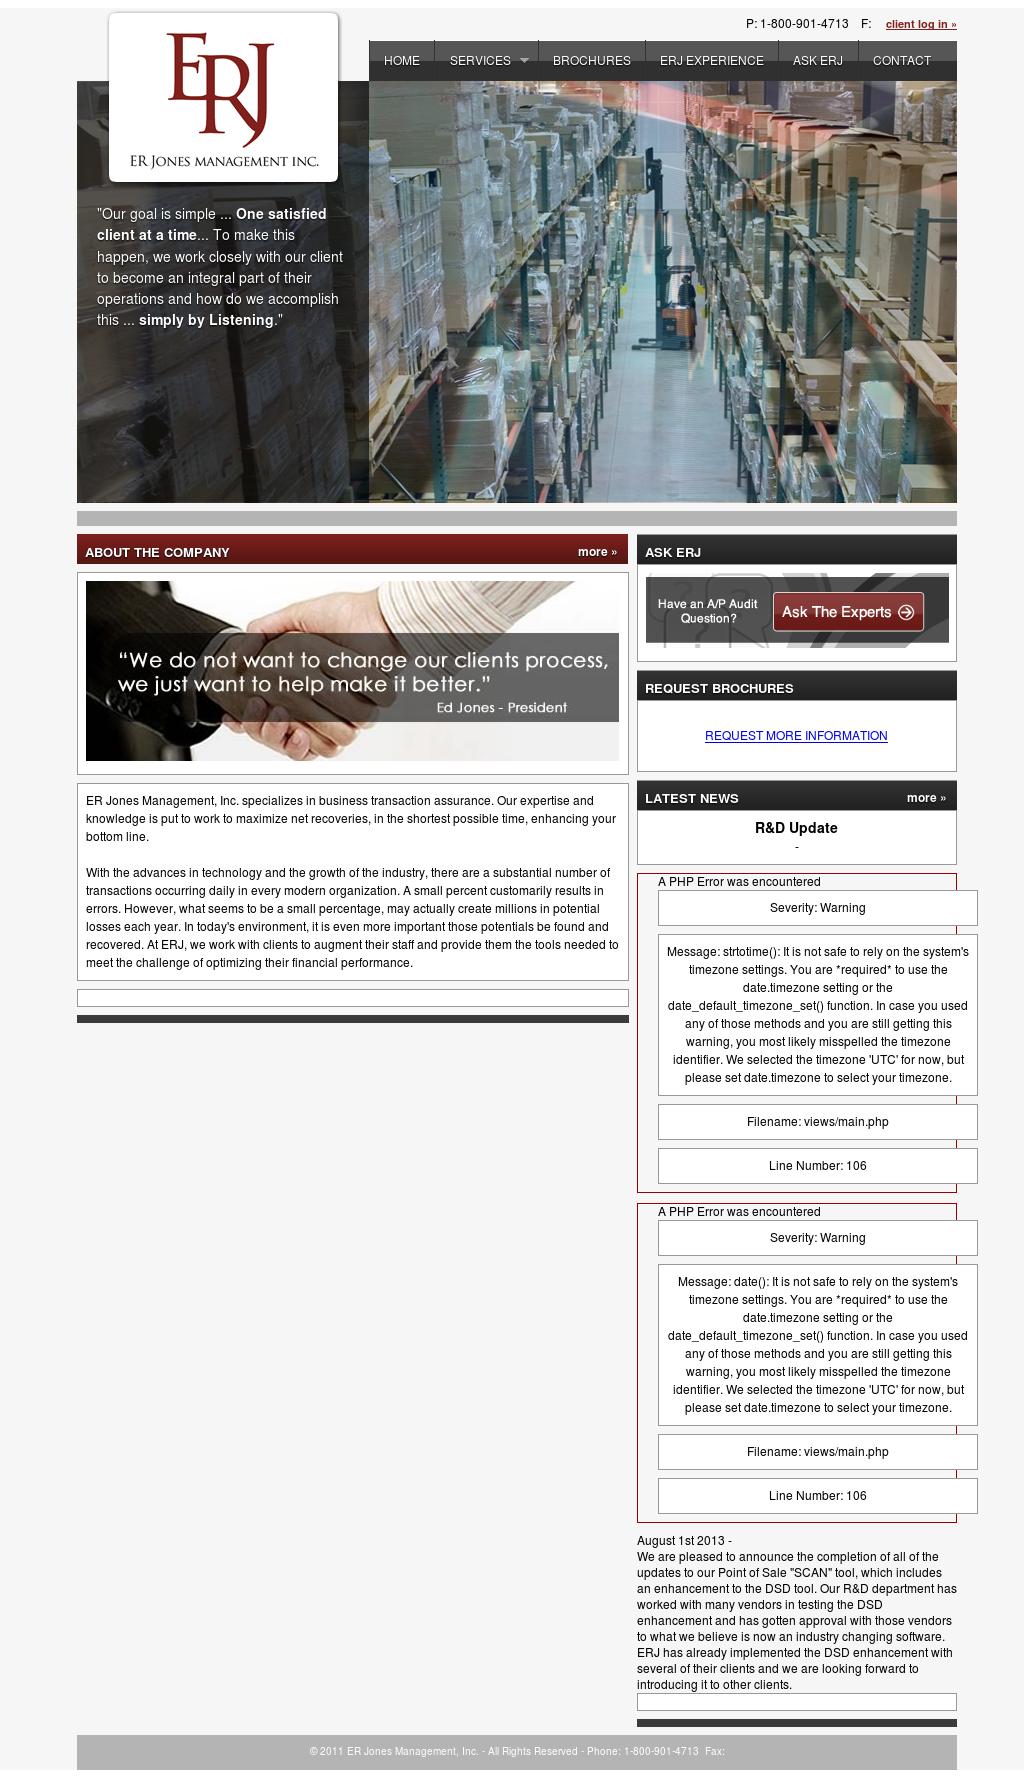 Ed Jones Login >> Er Jones Management Competitors Revenue And Employees